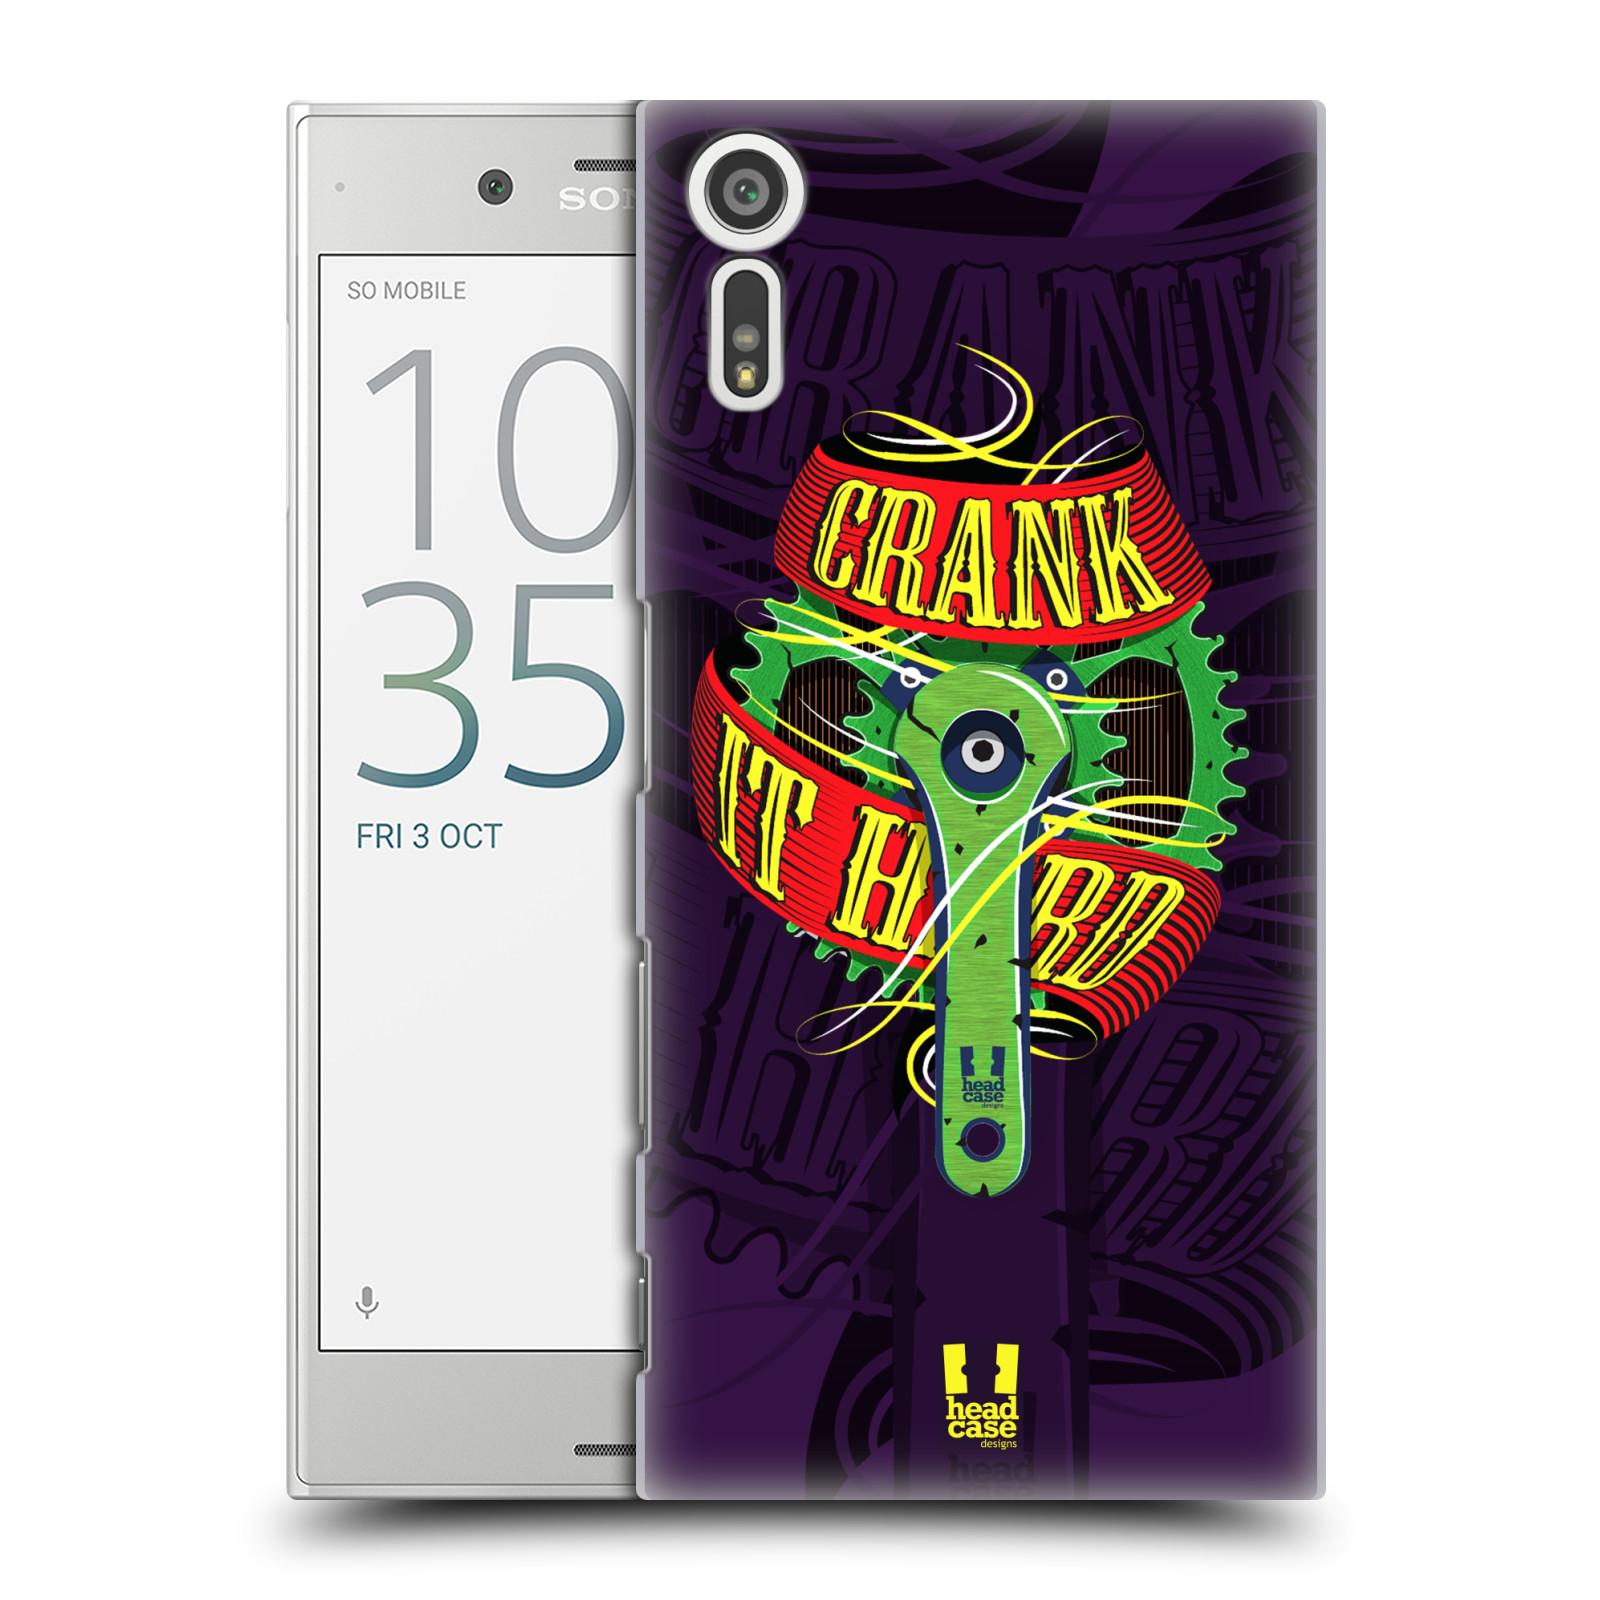 HEAD CASE plastový obal na mobil Sony Xperia XZ Cyklista pedály šlápni do toho CRANK IT HARD